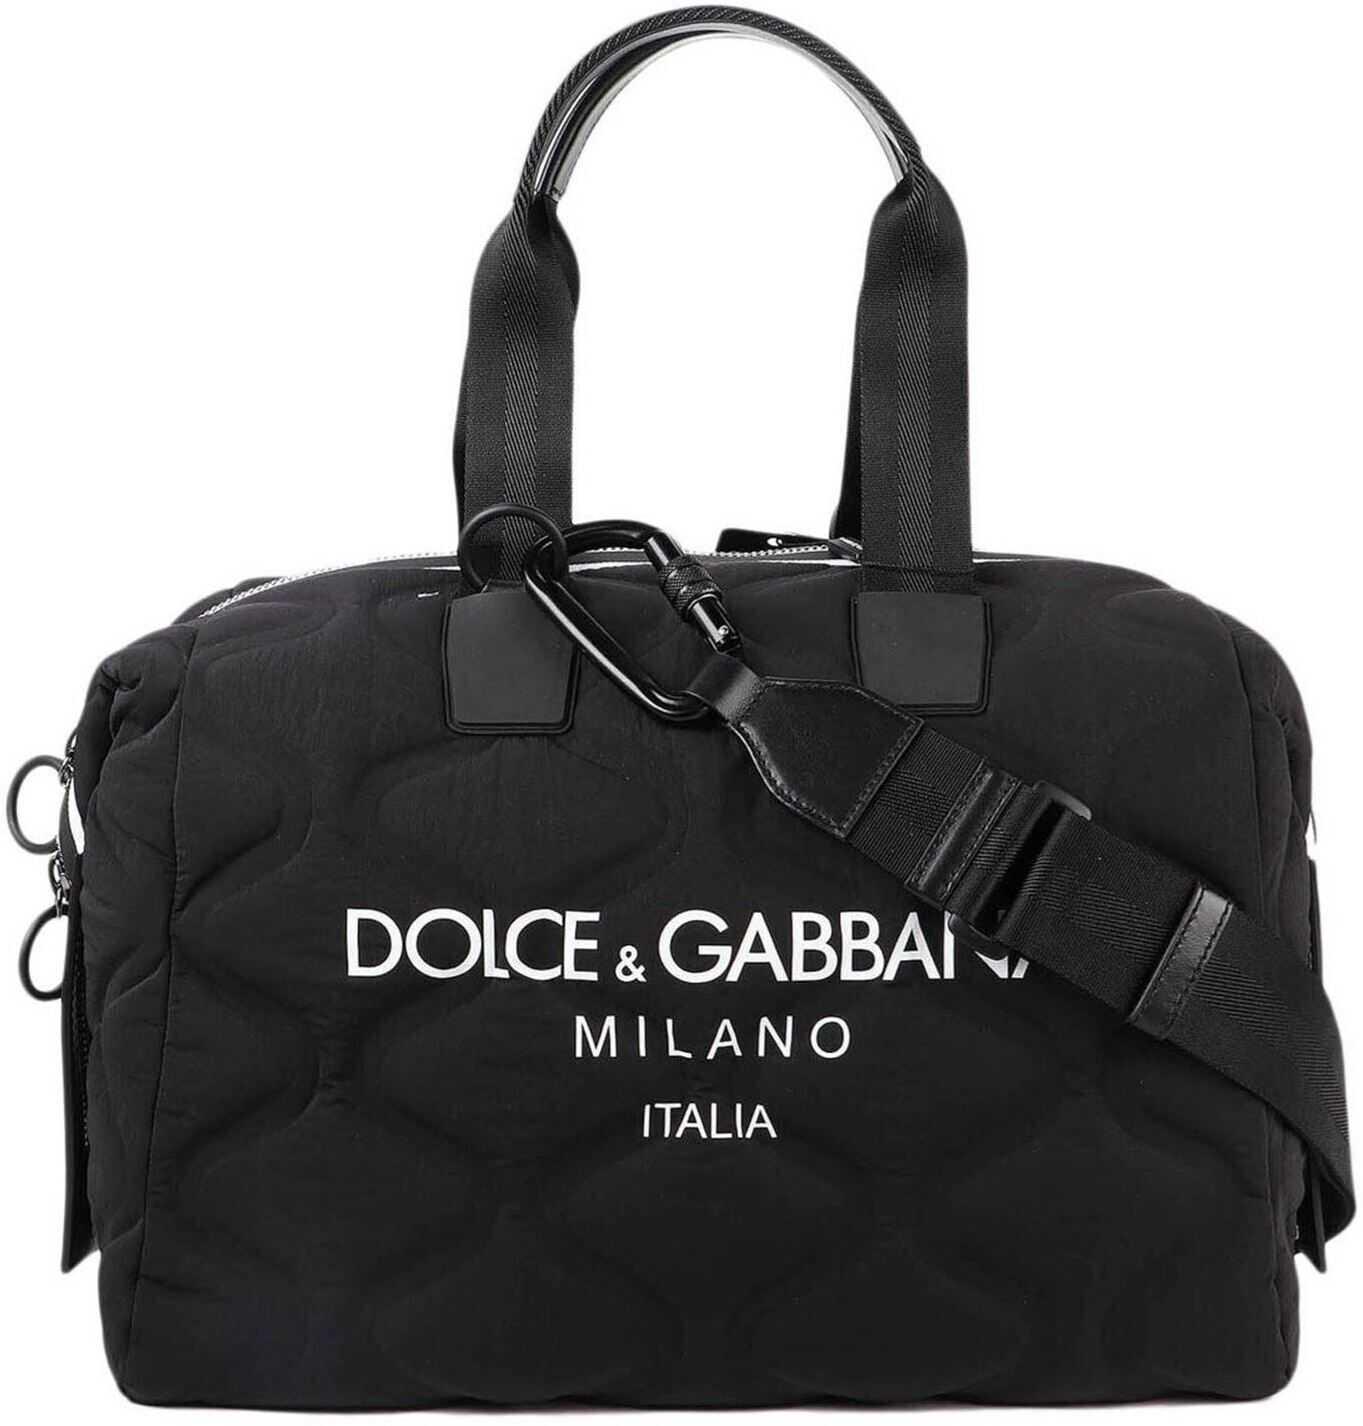 Dolce & Gabbana Palermo Duffle Bag In Black BM1739 AW140 89690 Black imagine b-mall.ro